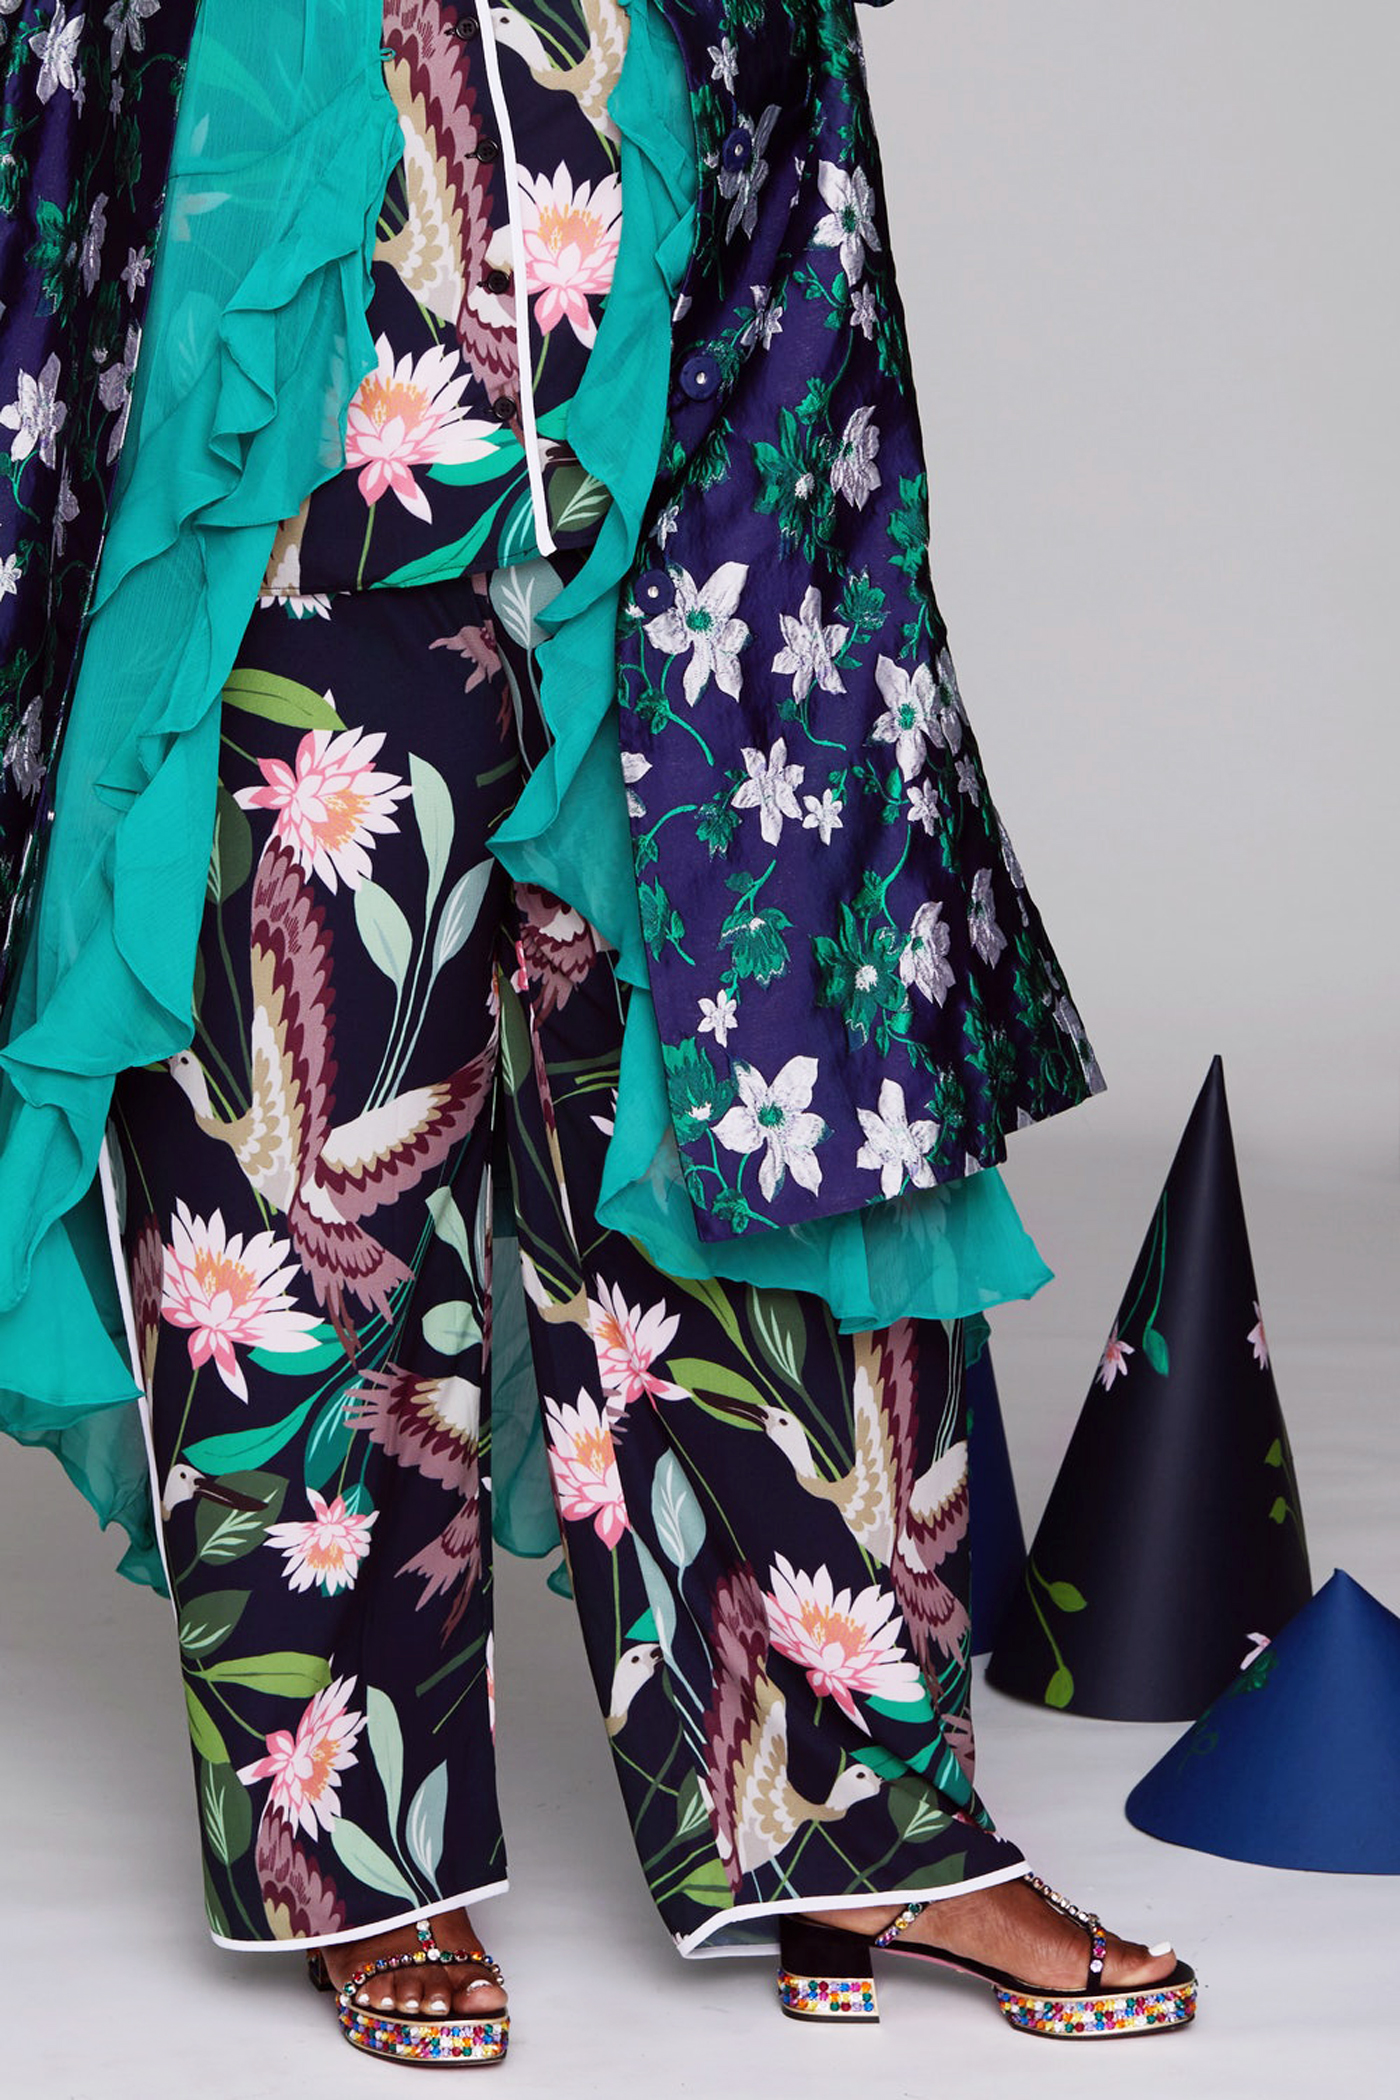 PlusSizedFashion_Look3_Florals_Detail.jpg